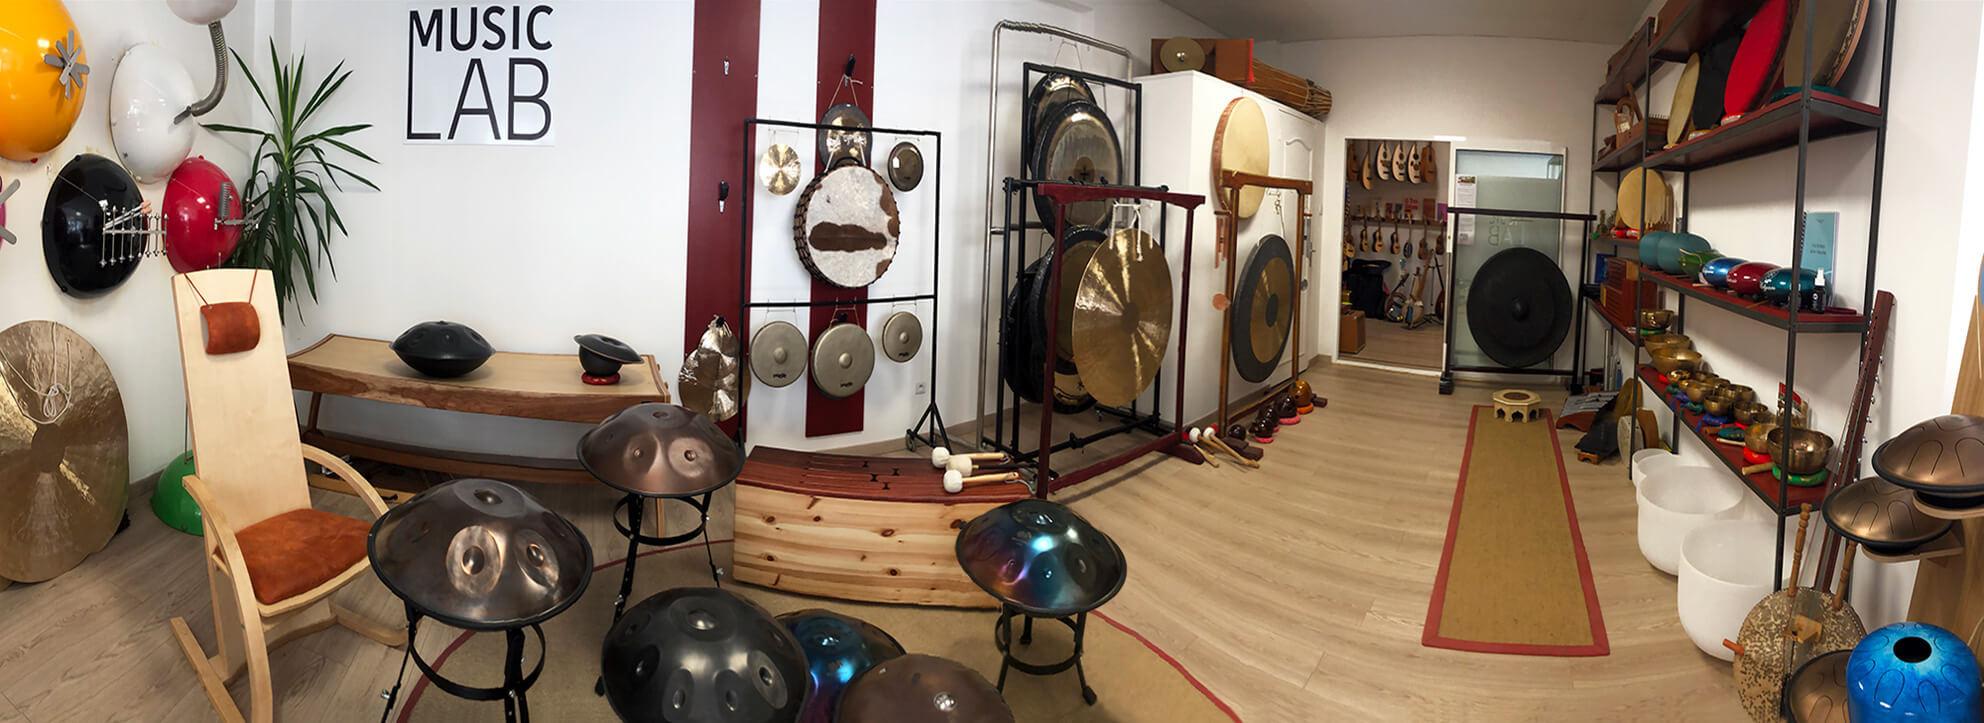 instruments du Music Lab Djoliba